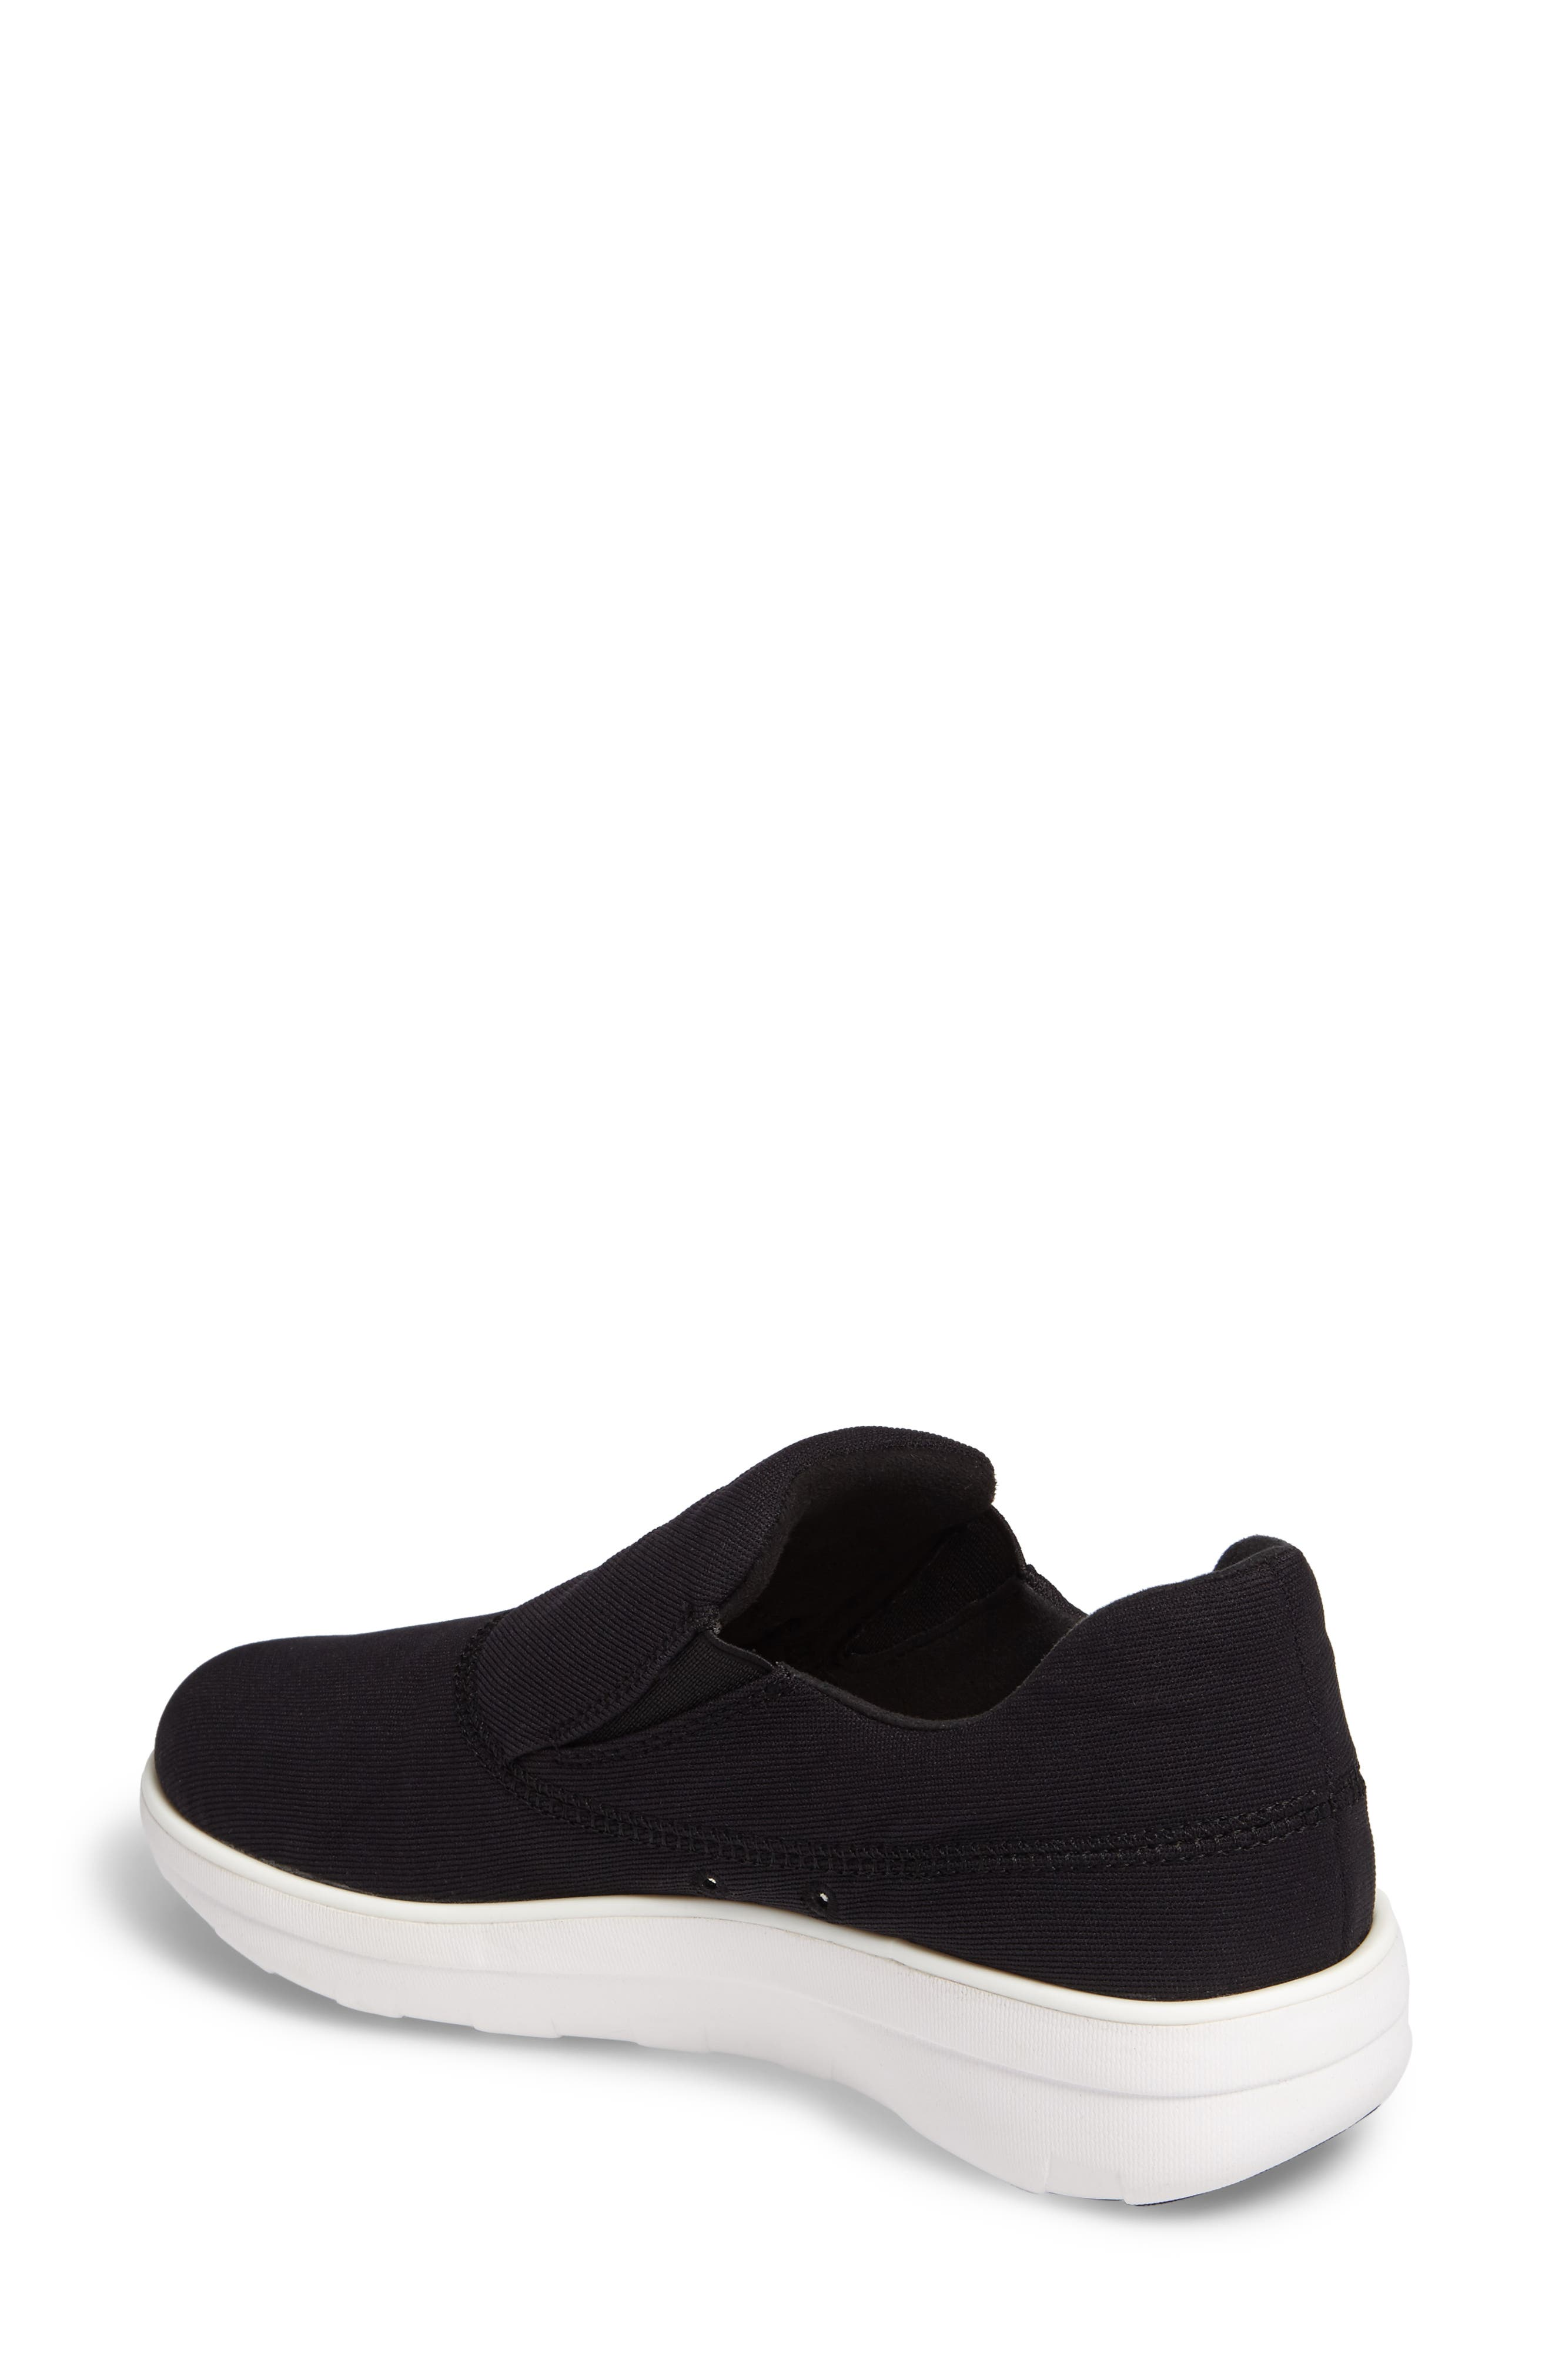 Alternate Image 2  - FitFlop Loaff Platform Slip-On Sneaker (Women)